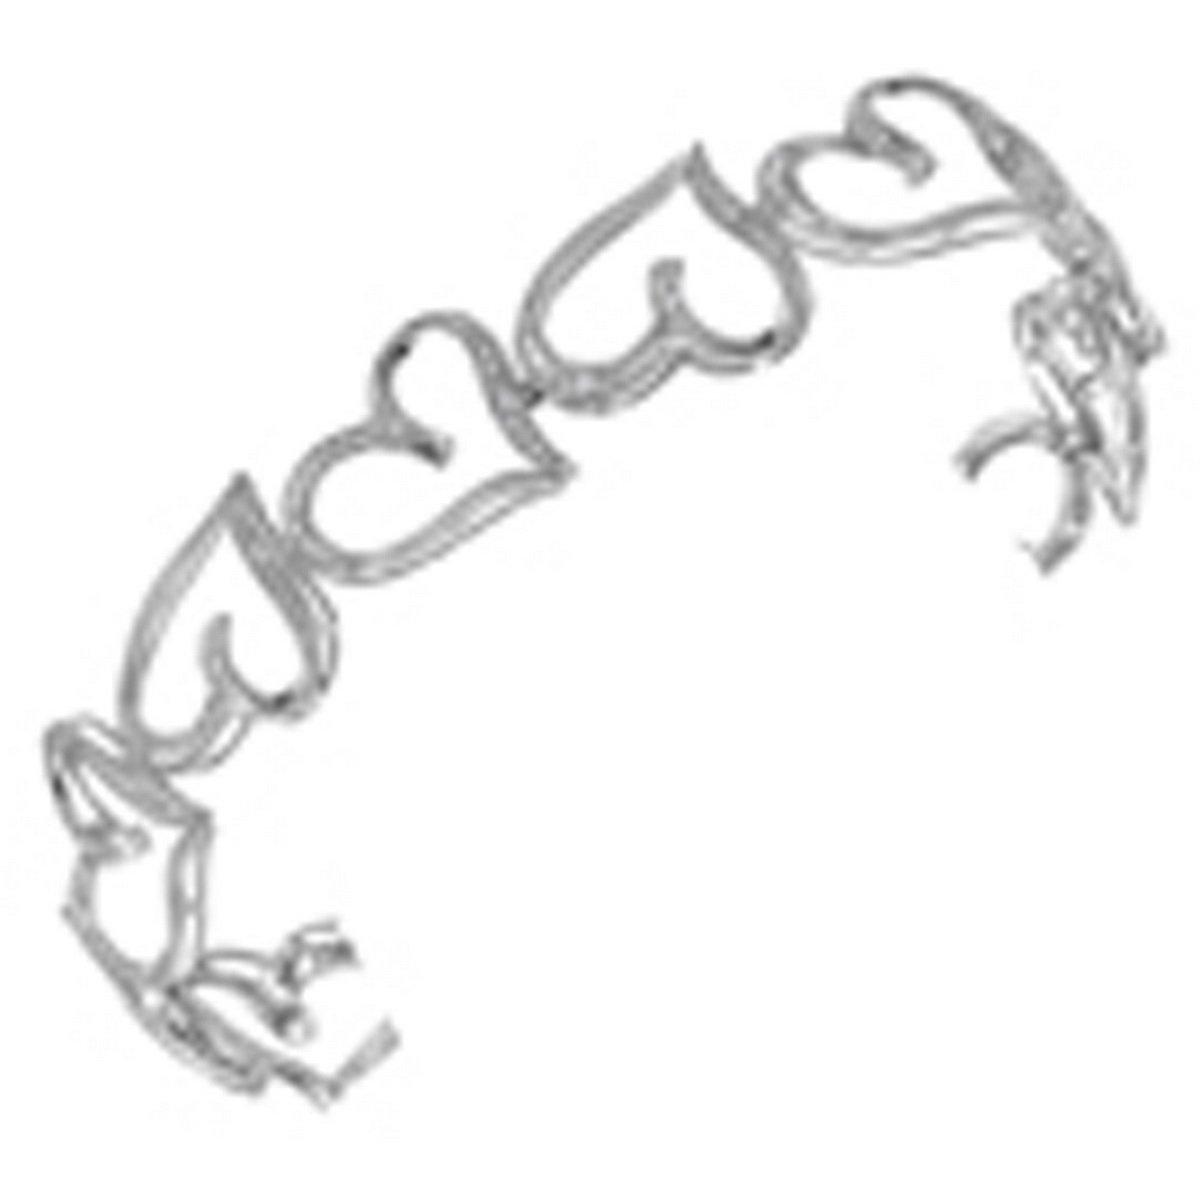 10kt White Gold Womens Round Diamond Heart Love Bangle Bracelet 1/8 Cttw (I2-I3 clarity; J-K color)